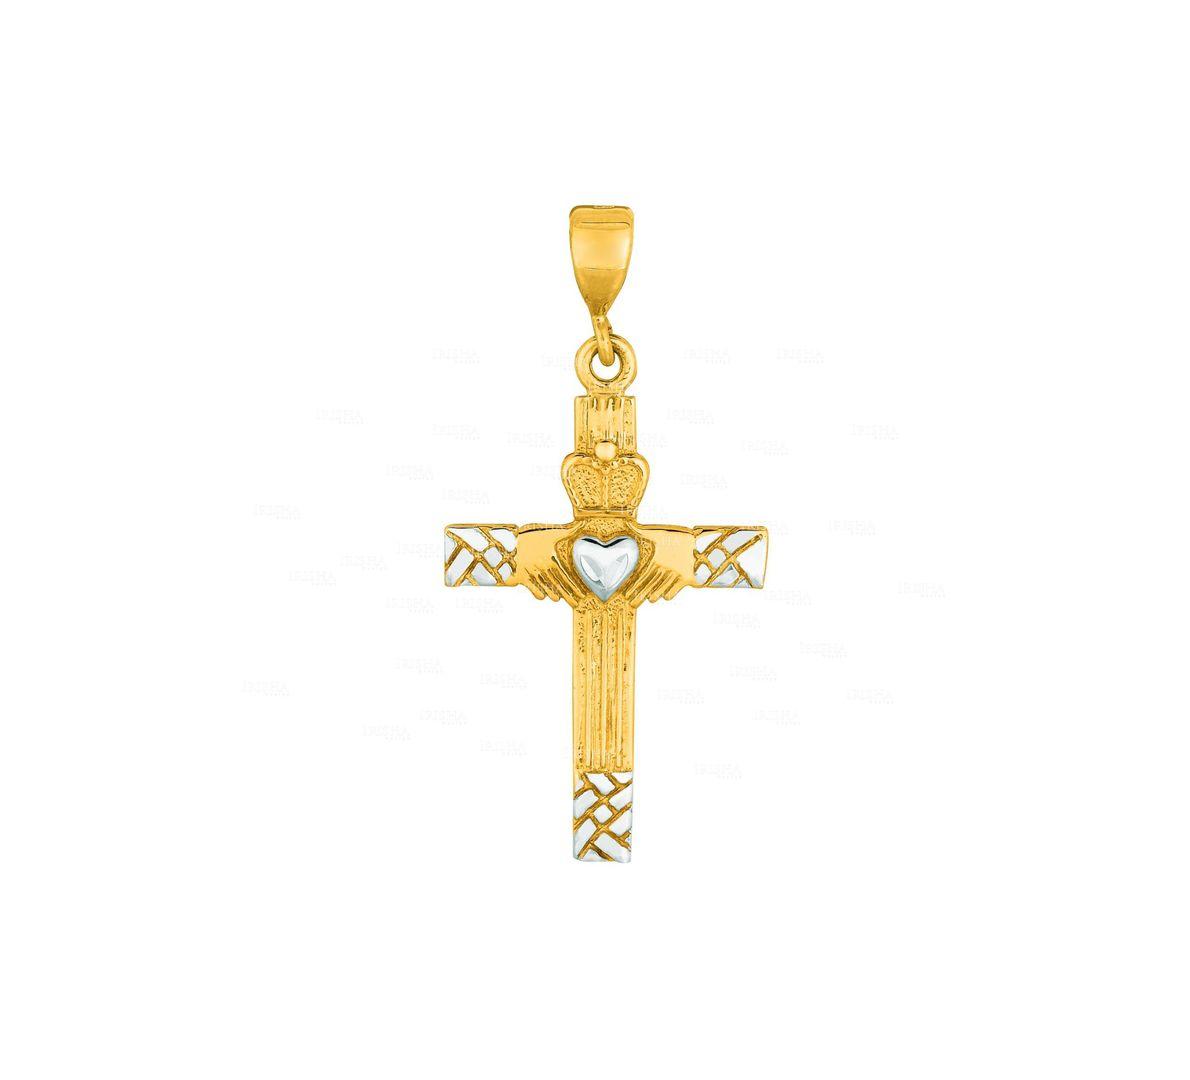 14K Yellow+White Gold Shiny Diamond Cut Claddagh Cross Pendant Christmas Jewelry